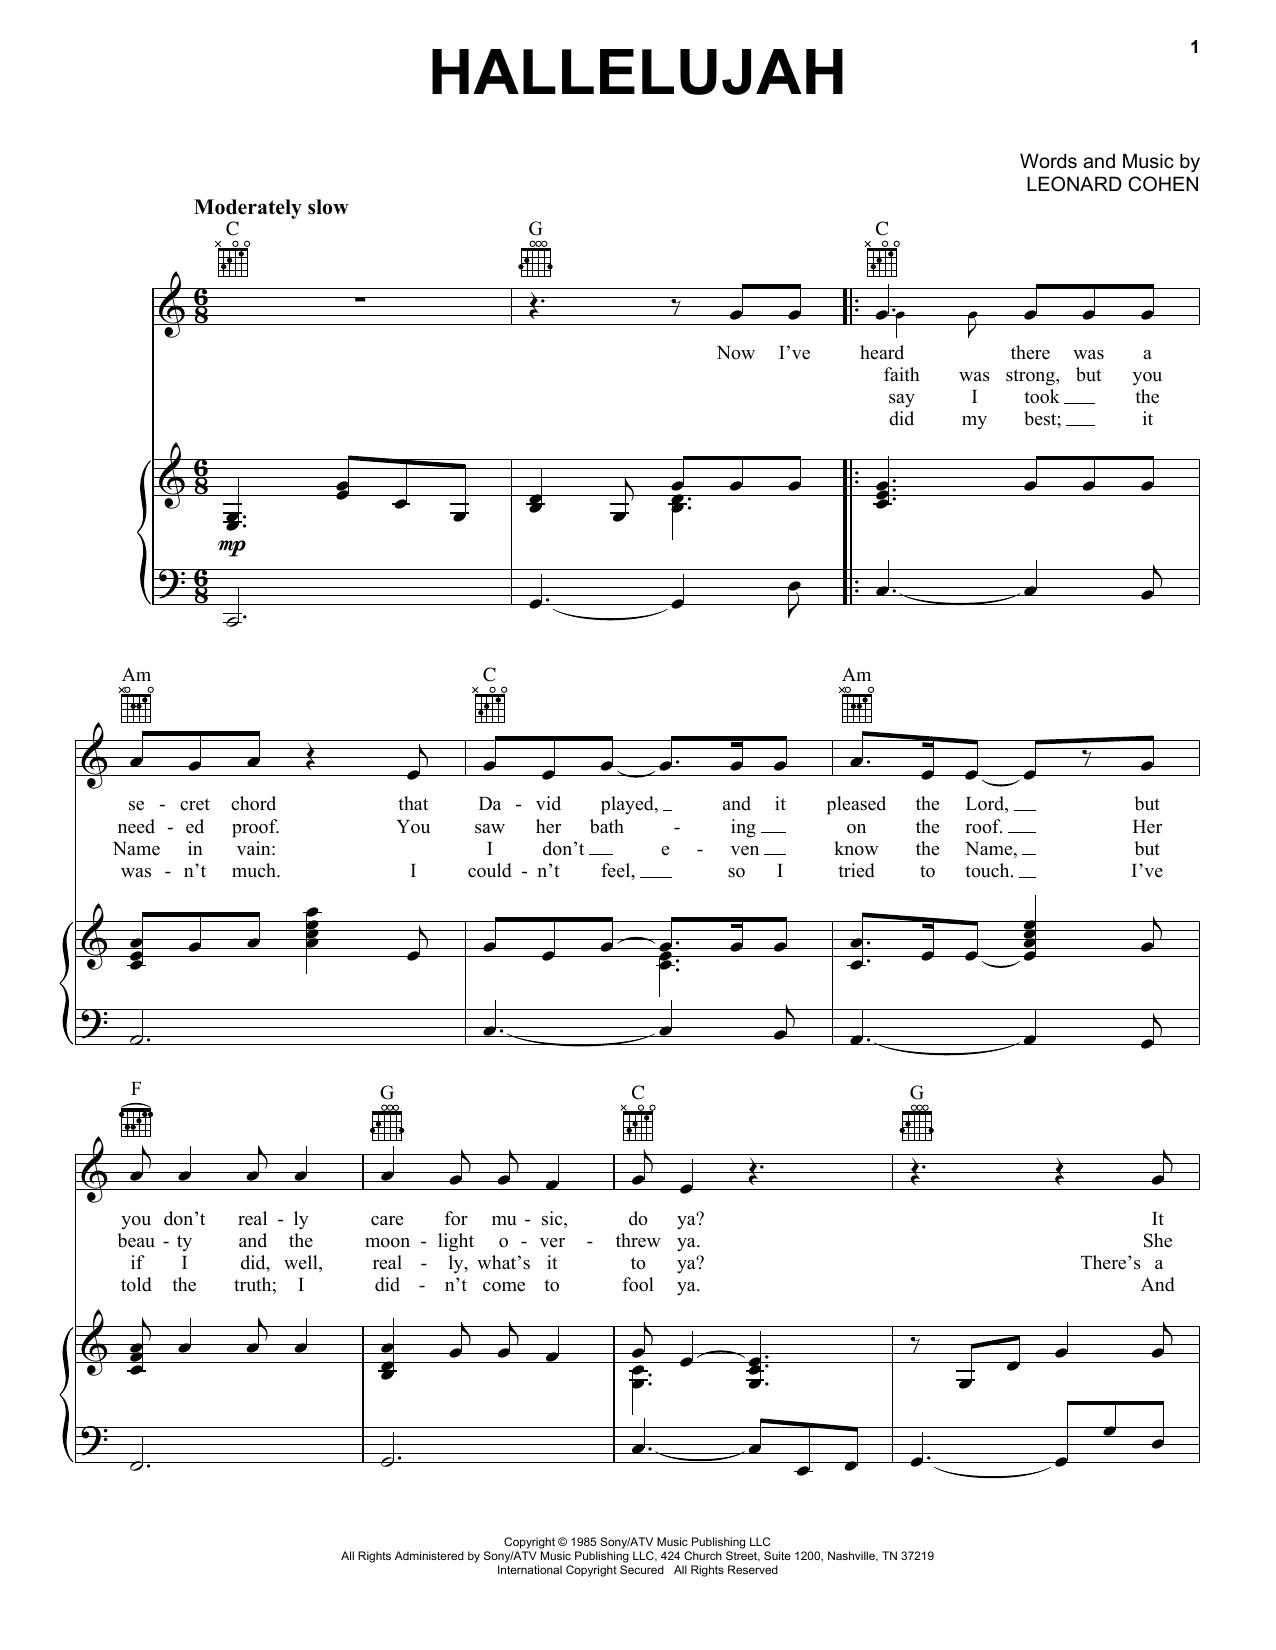 Leonard Cohen Hallelujah Sheet Music Notes Chords Download